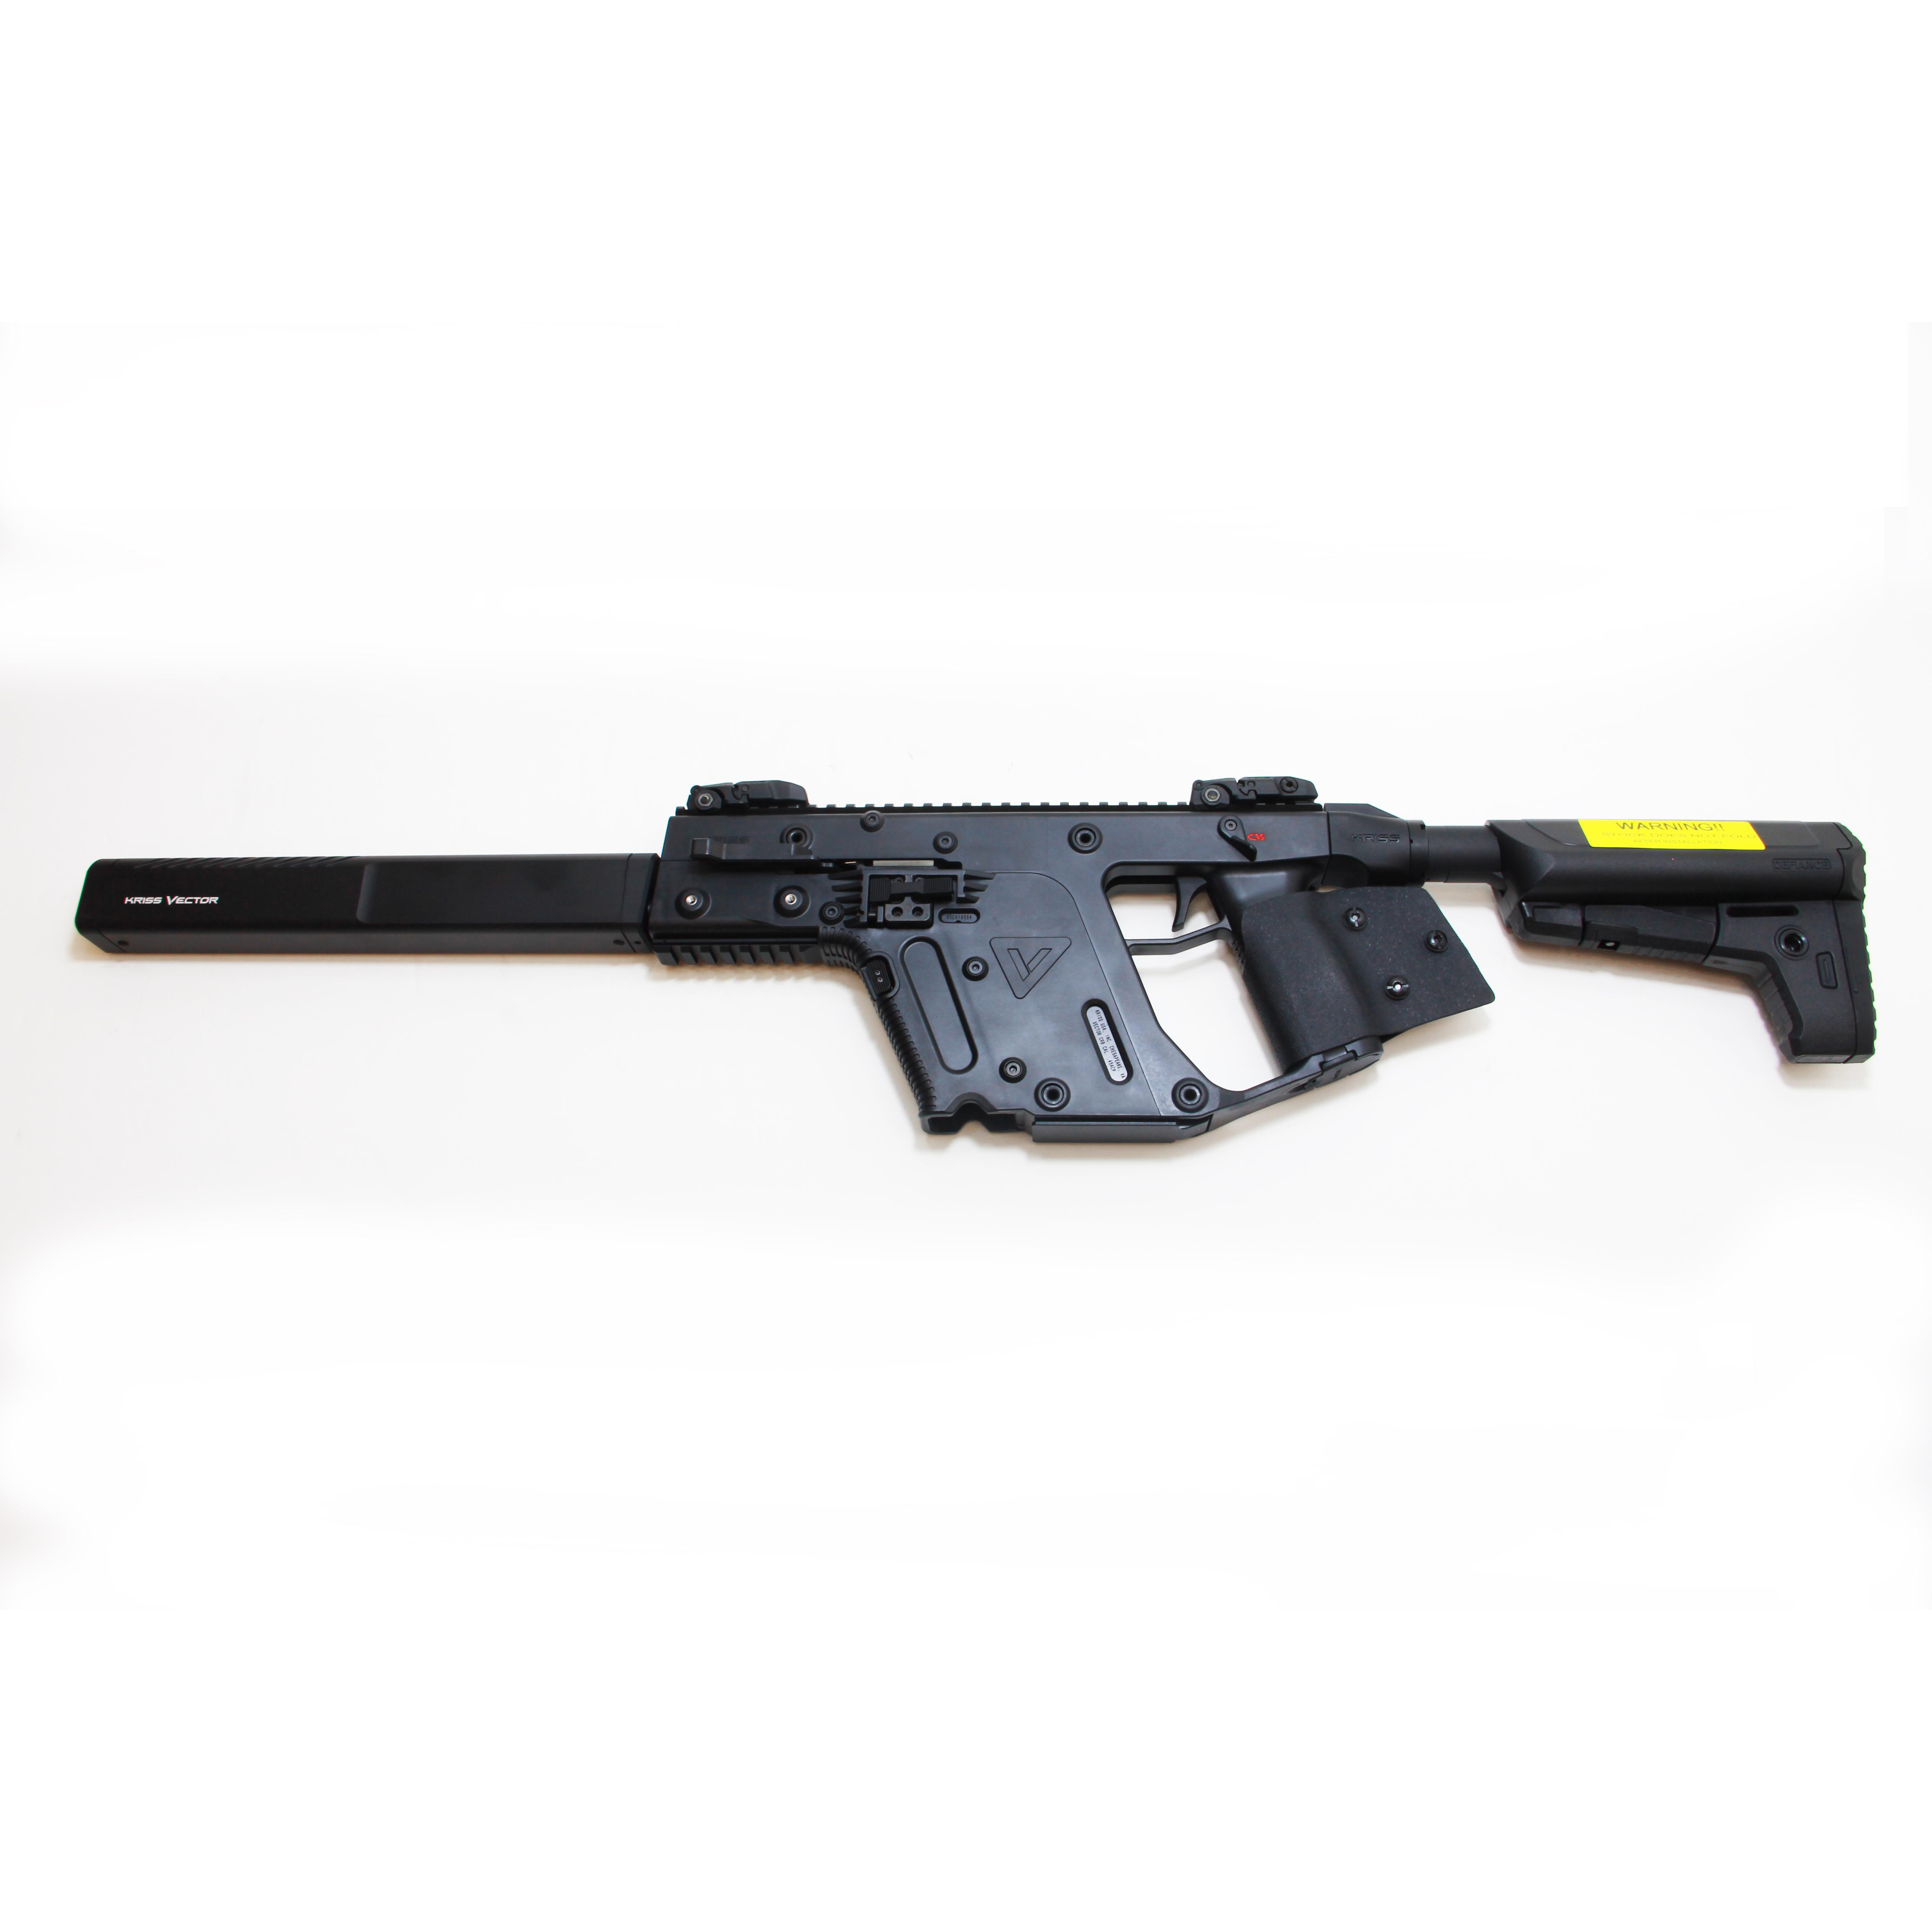 5184x5184 Kriss Vector Crb Gen 2 10mm Black